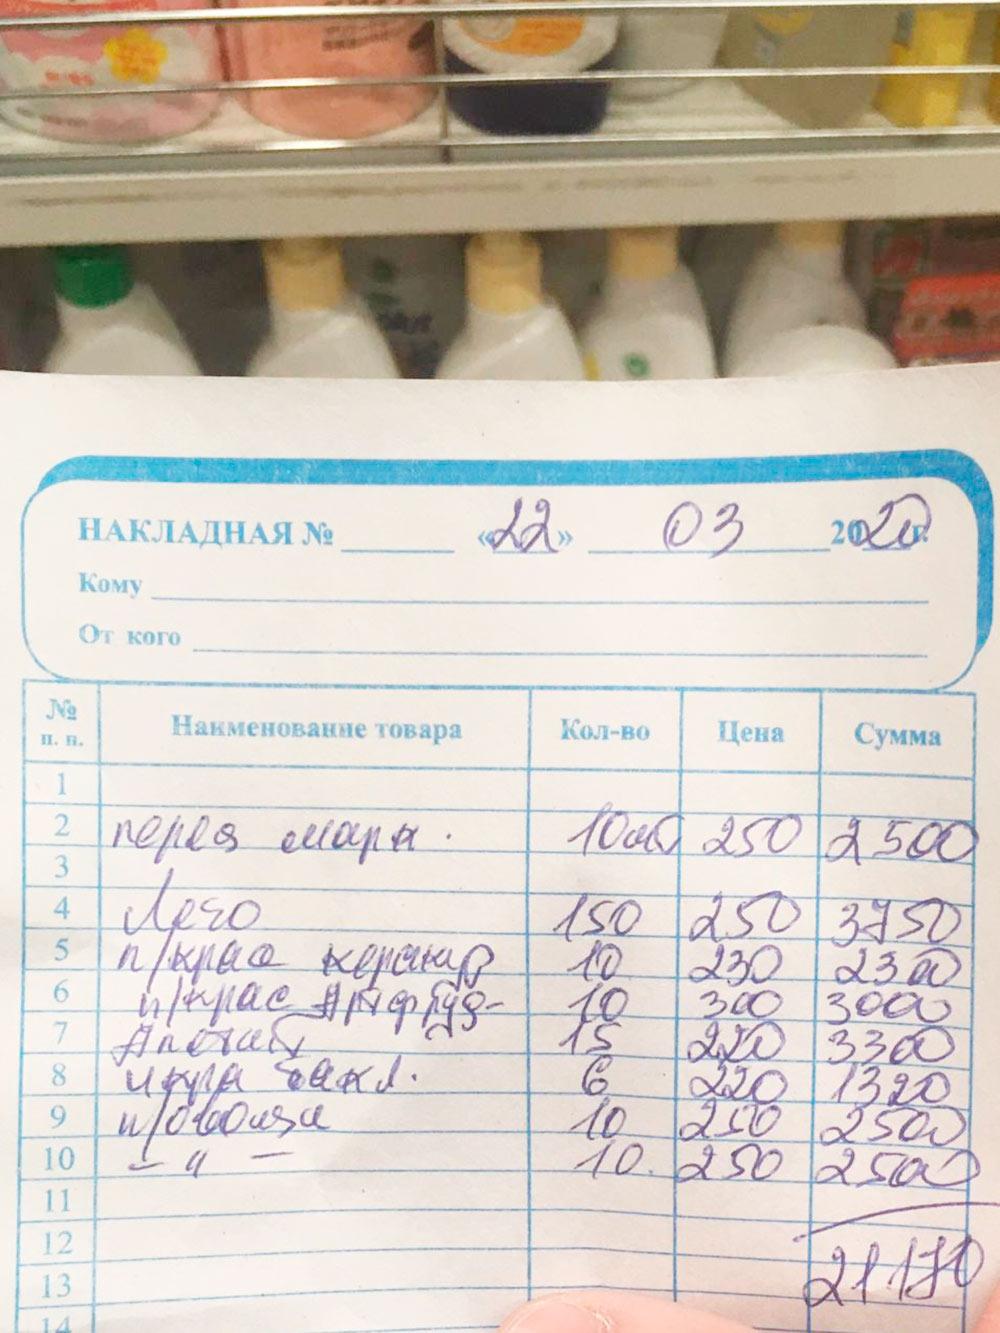 Цены на консервированные овощи из Армении — от 220 до 300<span class=ruble>Р</span> за банку 480 и 720 мл